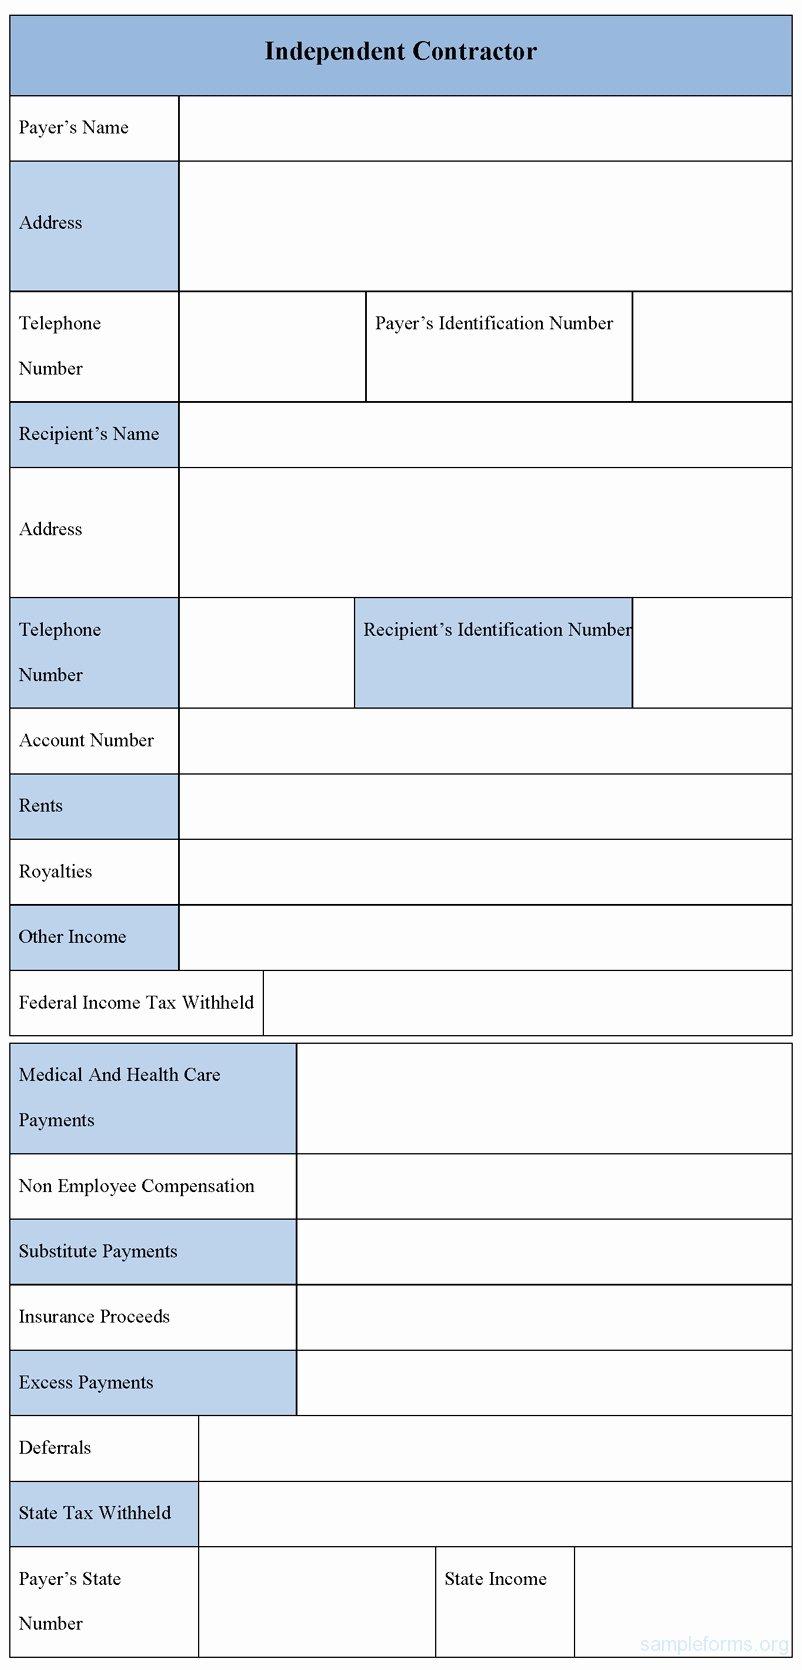 Independent Consultant Invoice Template Luxury Sample Independent Contractor Invoice Invoice Template Ideas